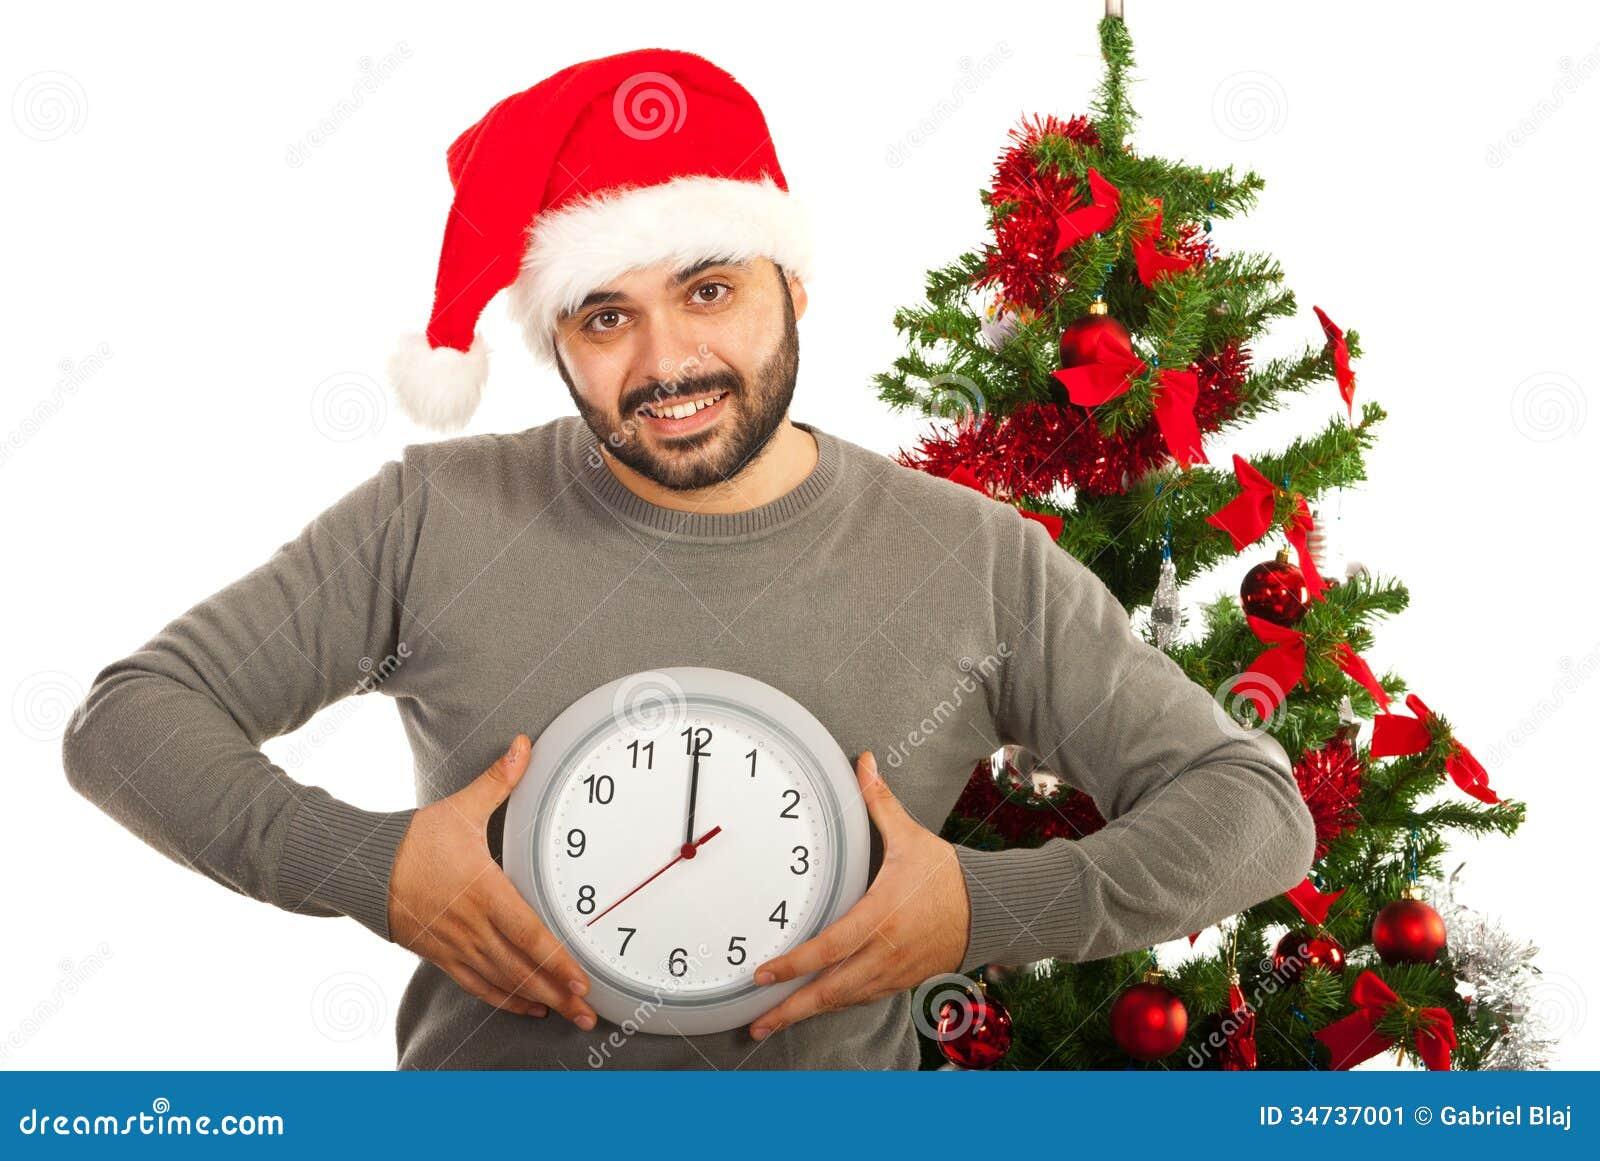 Happy Christmas Man Stock Image - Image: 34737001